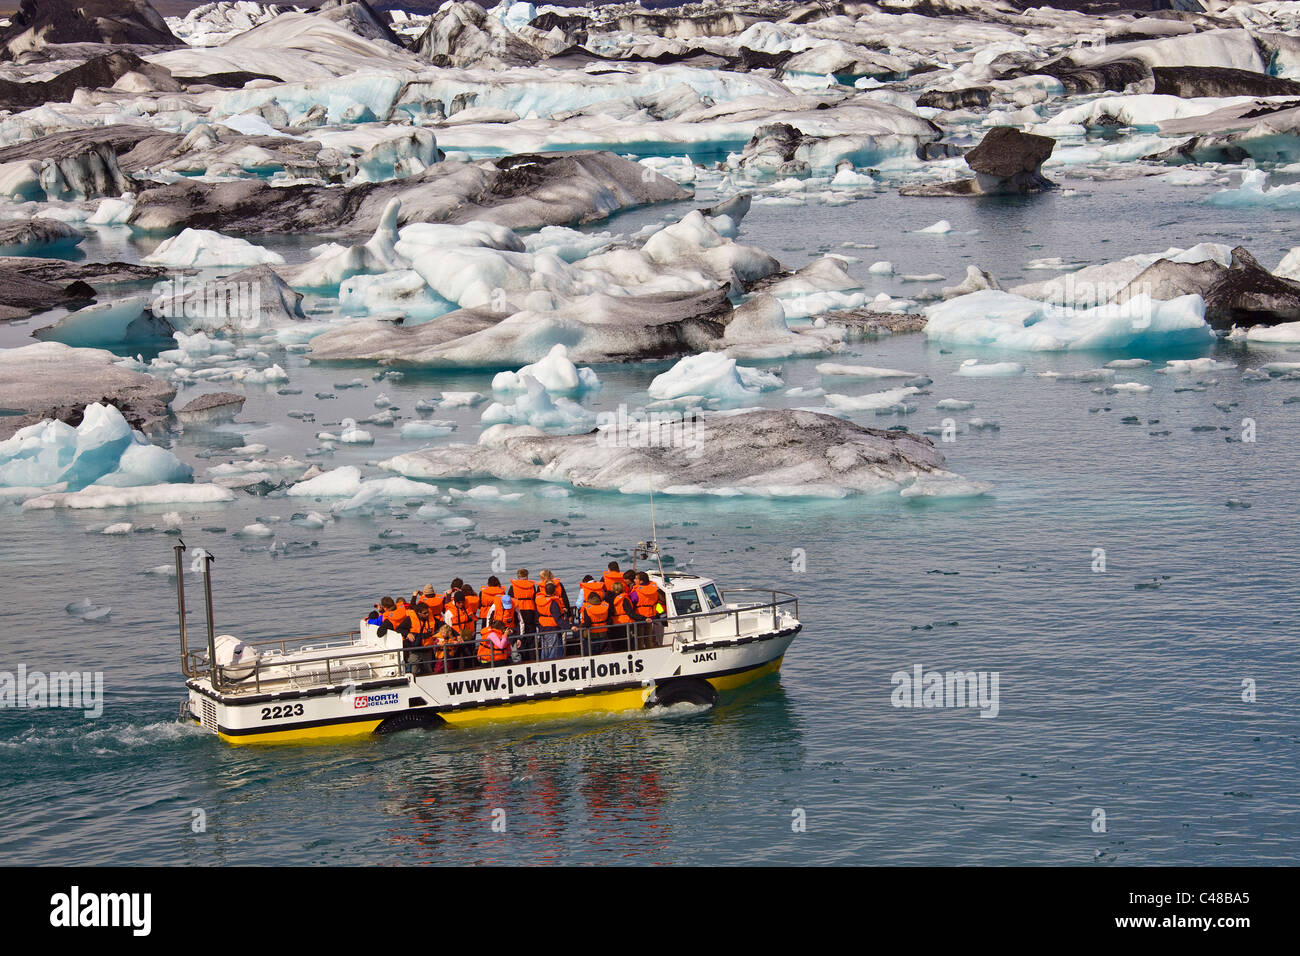 Amphibienfahrzeug mit Touristen an Bord auf dem Gletschersee Jökulsarlon, Jökulsárlón, Vatnajökull, - Stock Image